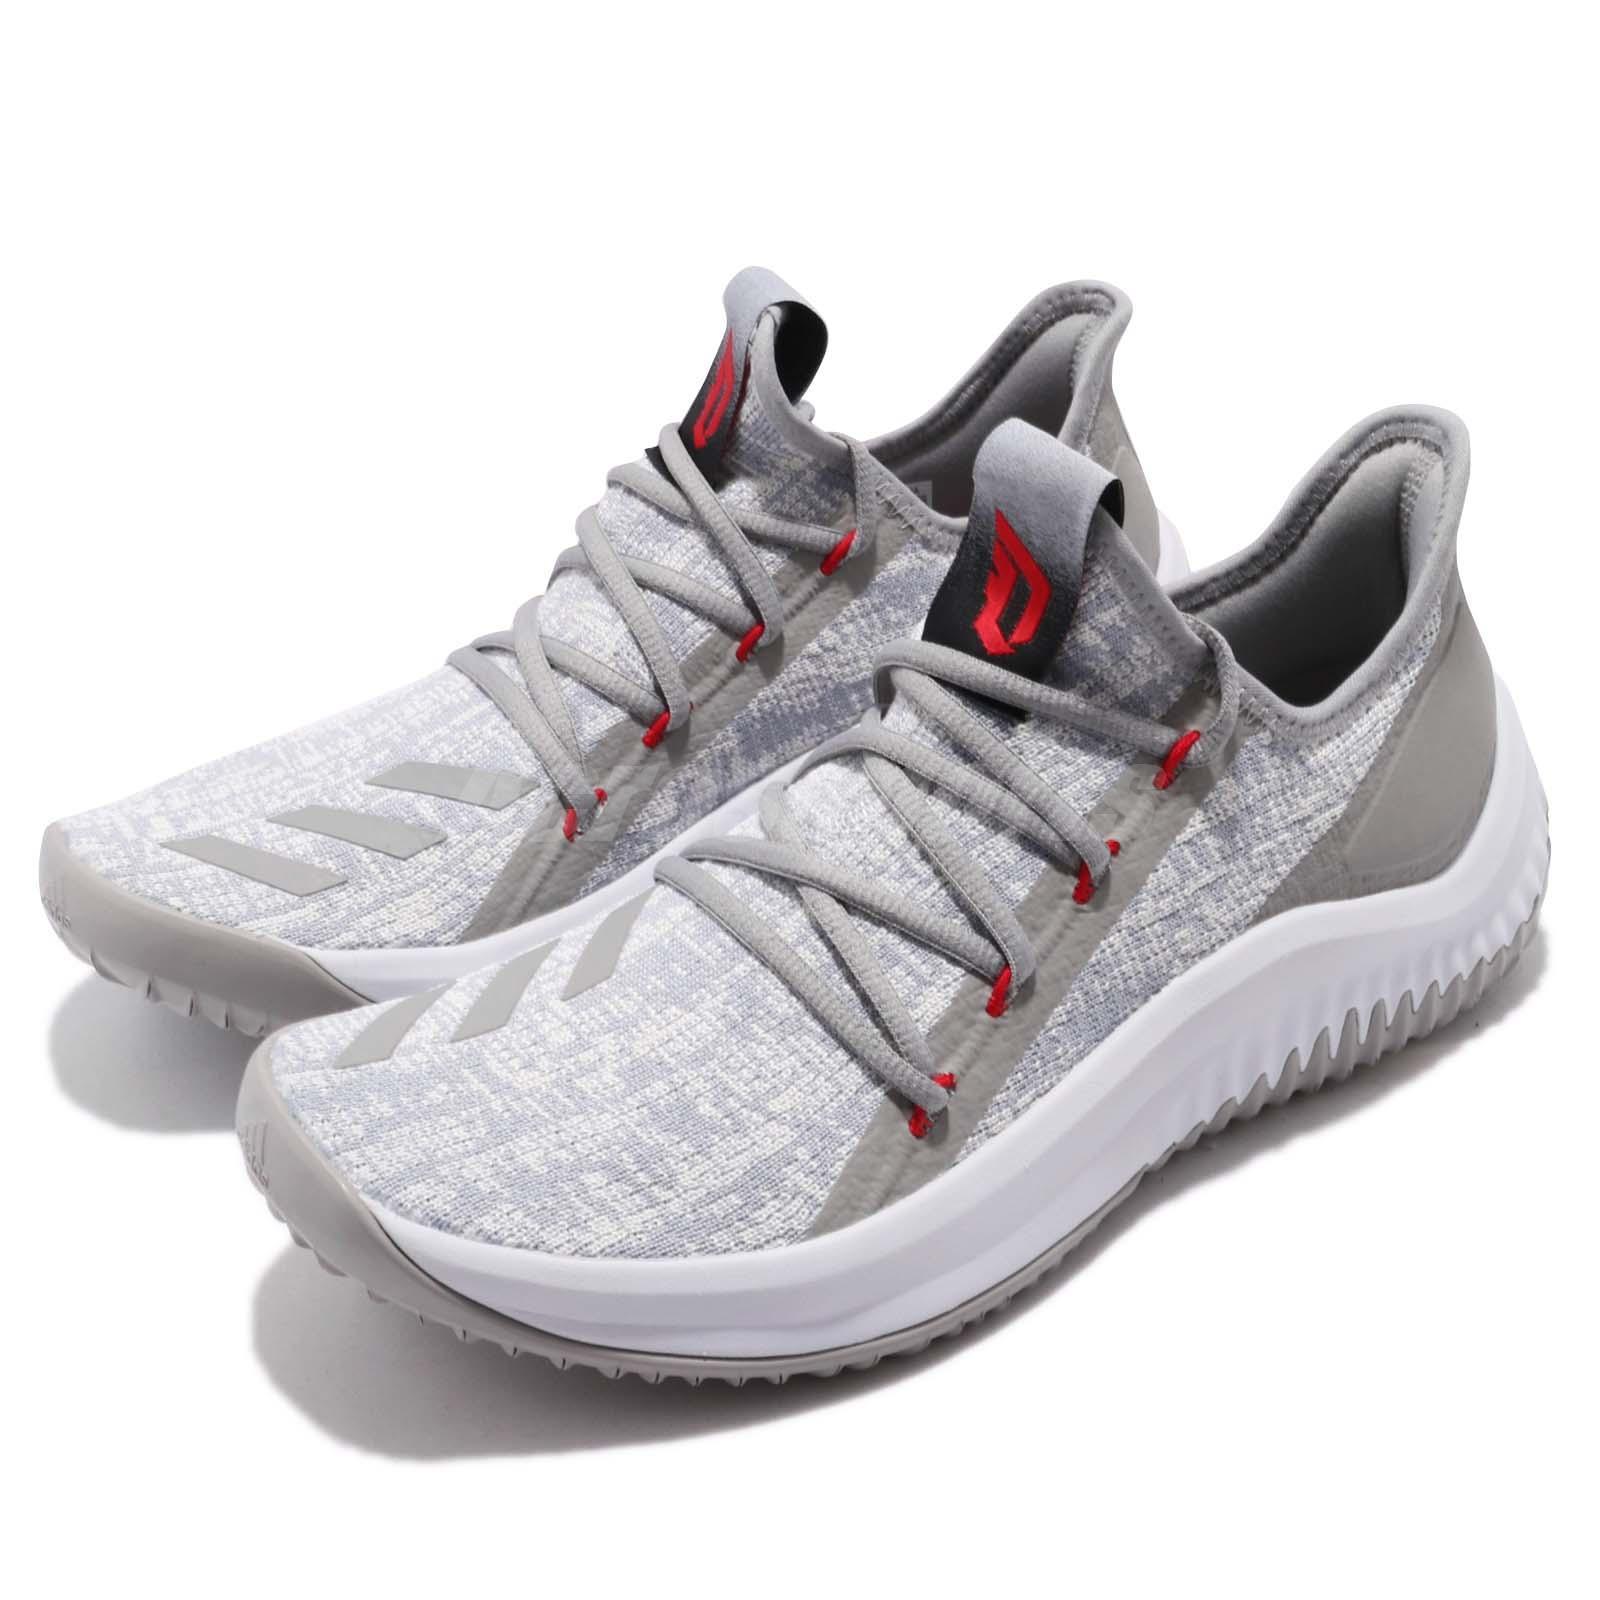 newest 5d171 77f11 Details about adidas Dame D.O.L.L.A. Damian Lillard Grey White Men  Basketball Sneakers DB1073